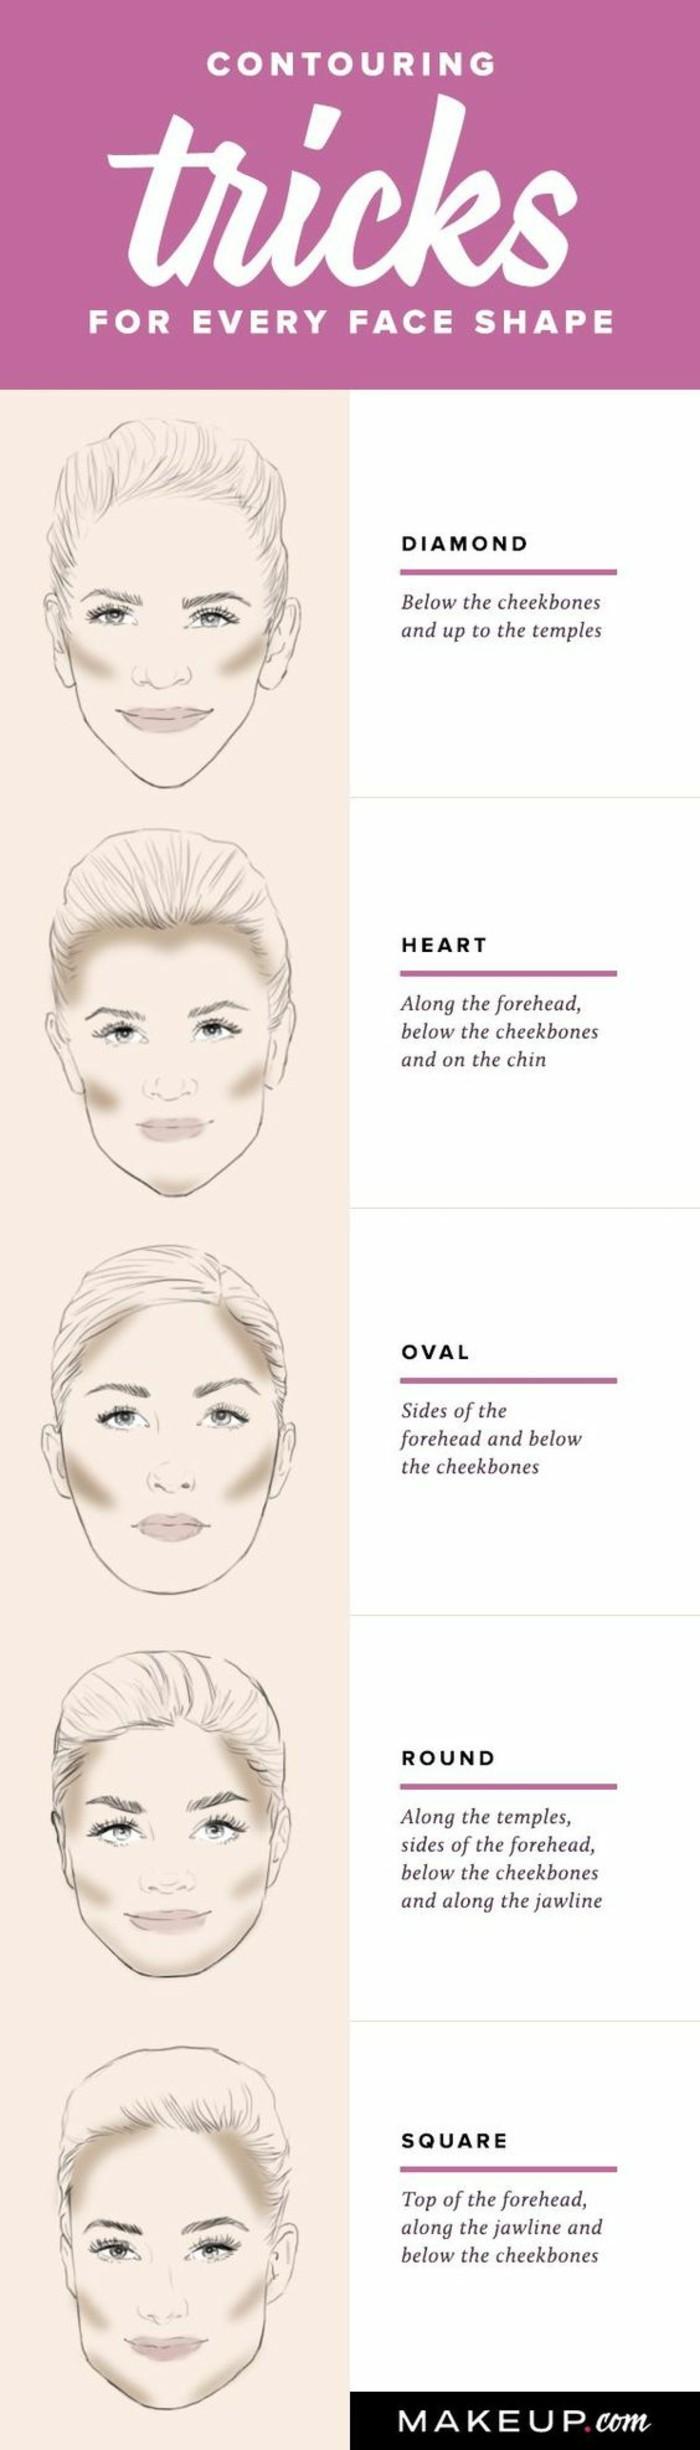 tuto-maquillage-contouring-visages-différentes